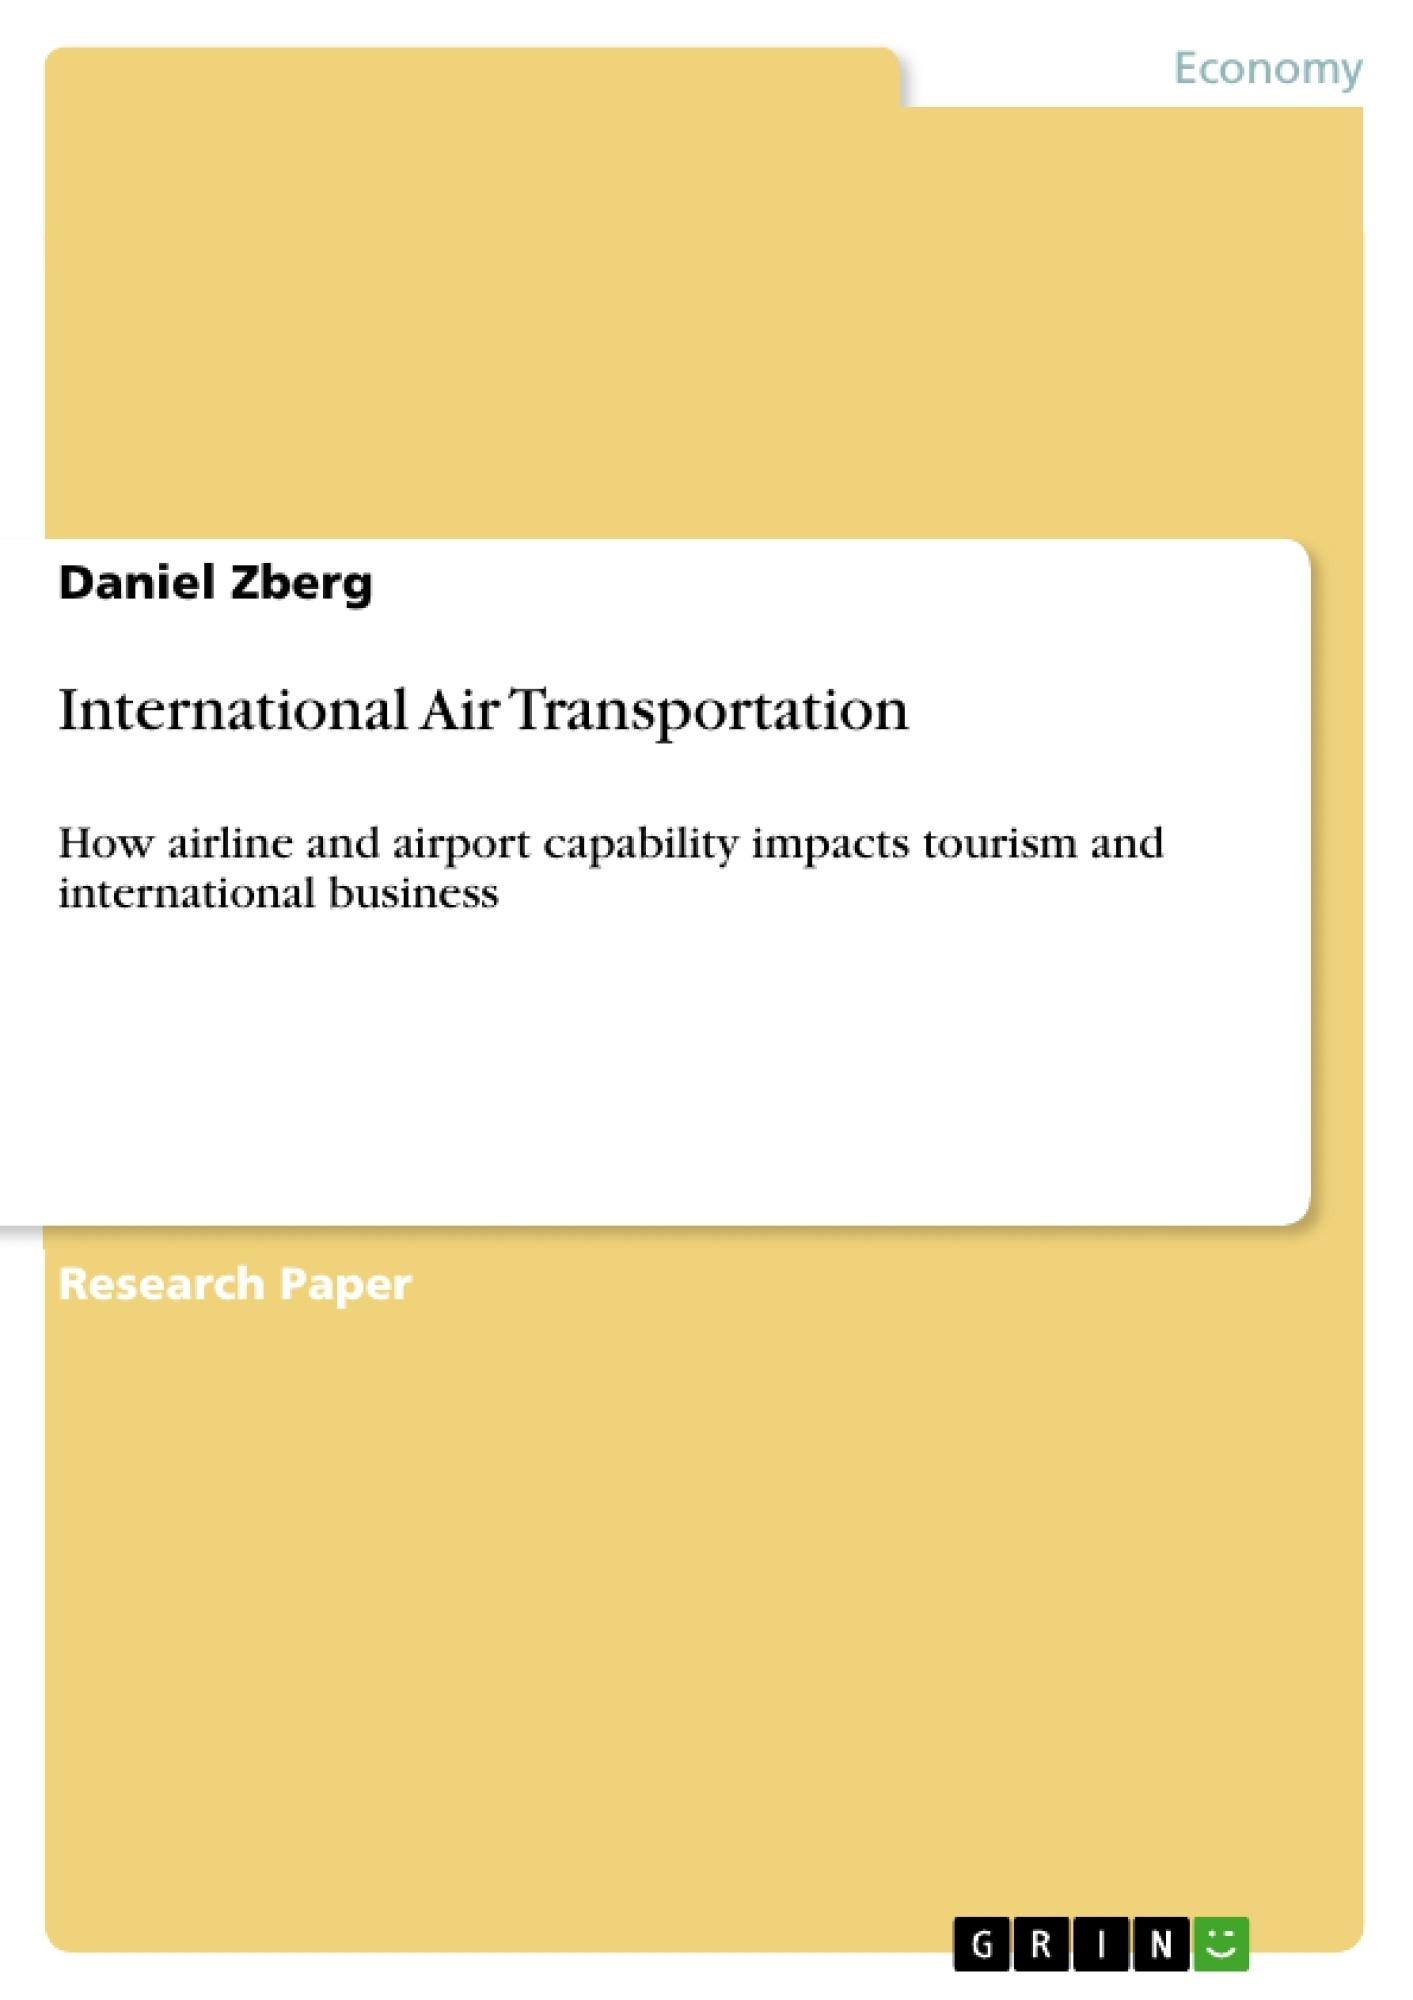 Title: International Air Transportation